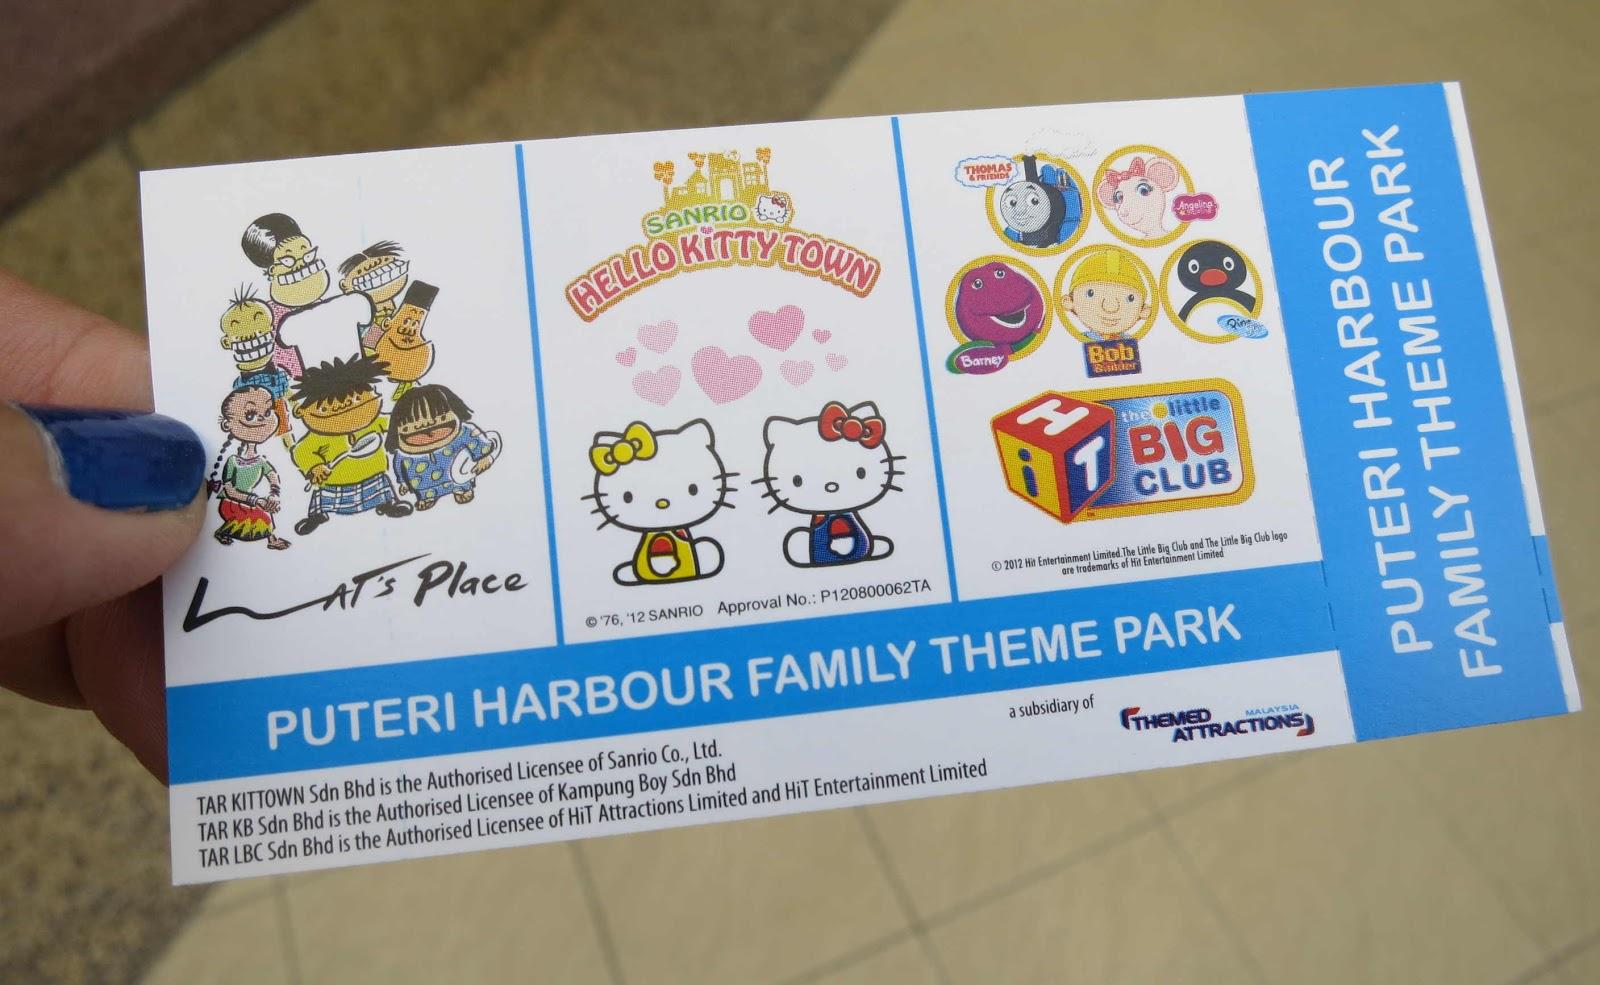 Hello kitty town puteri harbour family theme park johor bahru malaysia - My Ticket To The Attractions At Puteri Harbour Family Theme Park In Nusajaya